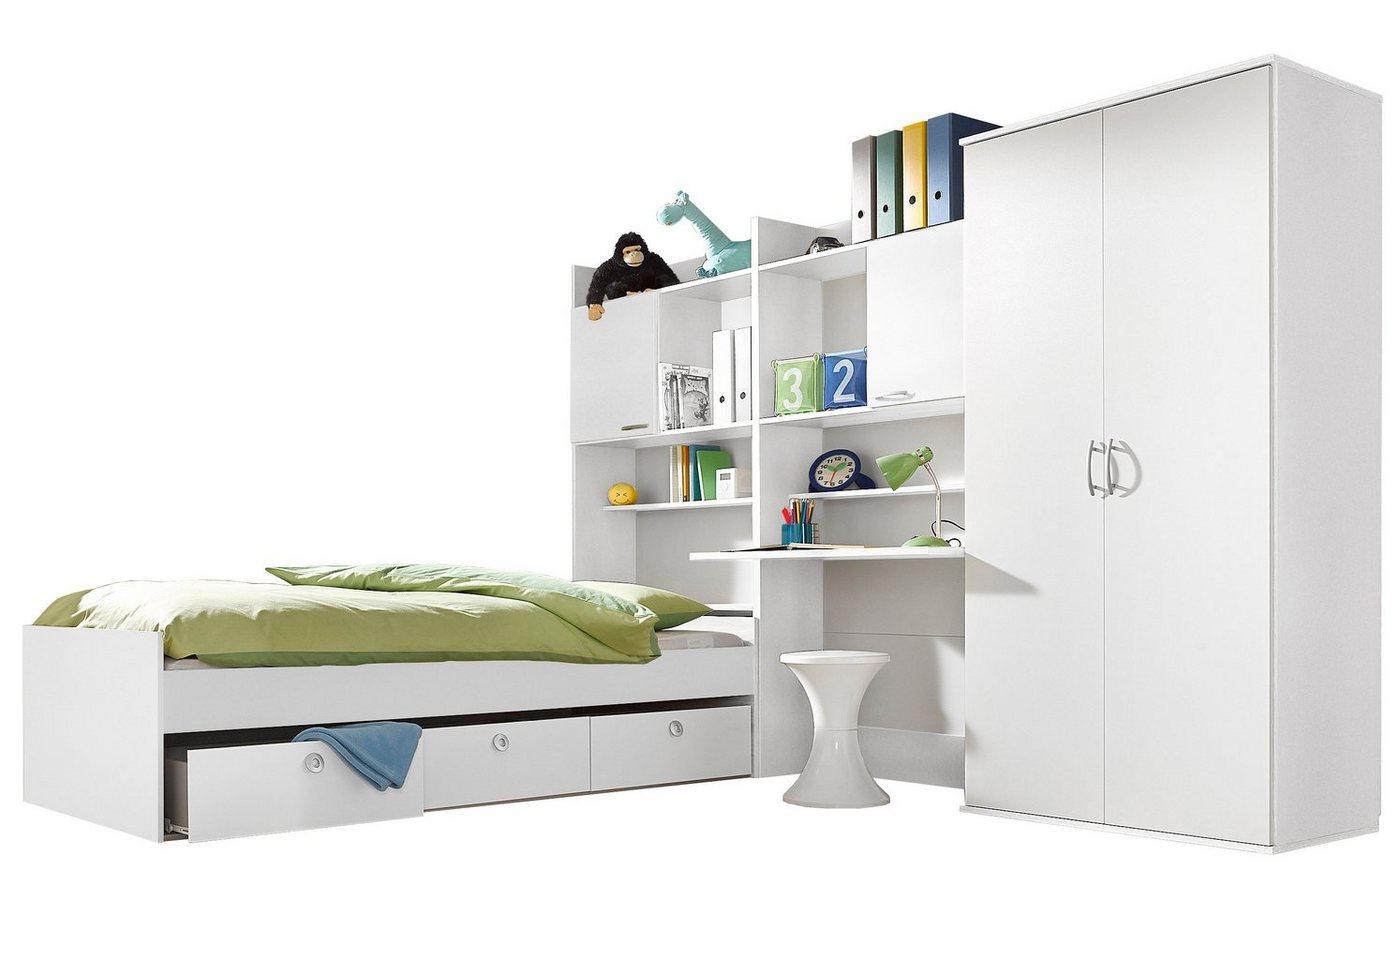 w rter suchen r tsel nummer 829 kostenlos online l sen. Black Bedroom Furniture Sets. Home Design Ideas